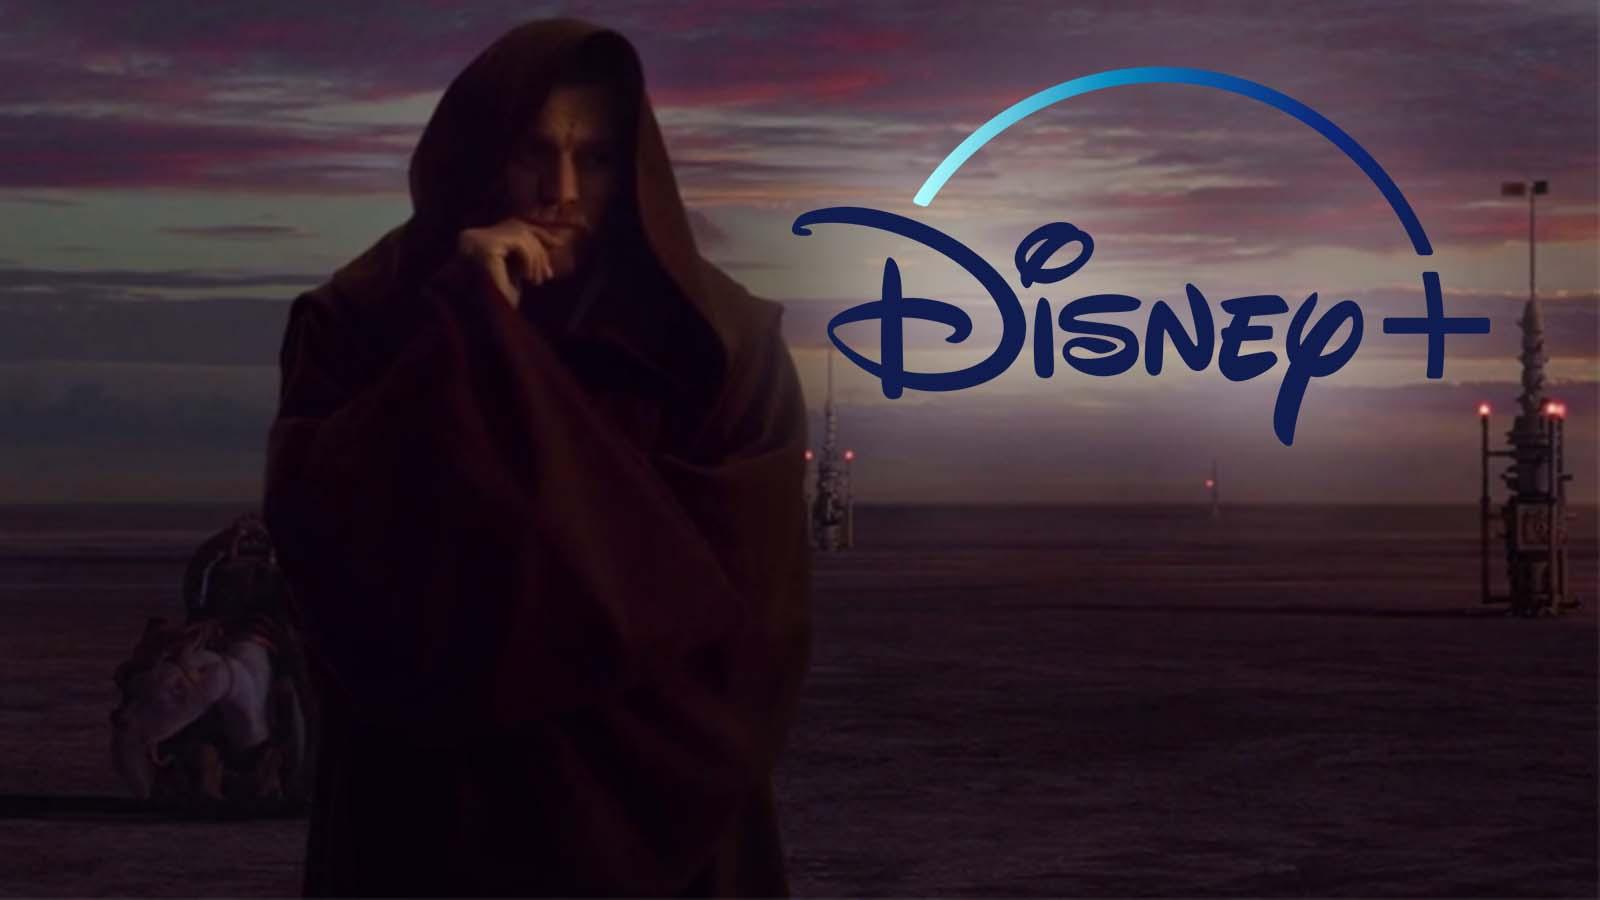 'Obi-Wan Kenobi' Series Headed To Disney+ ;Ewan McGregor Set to Return